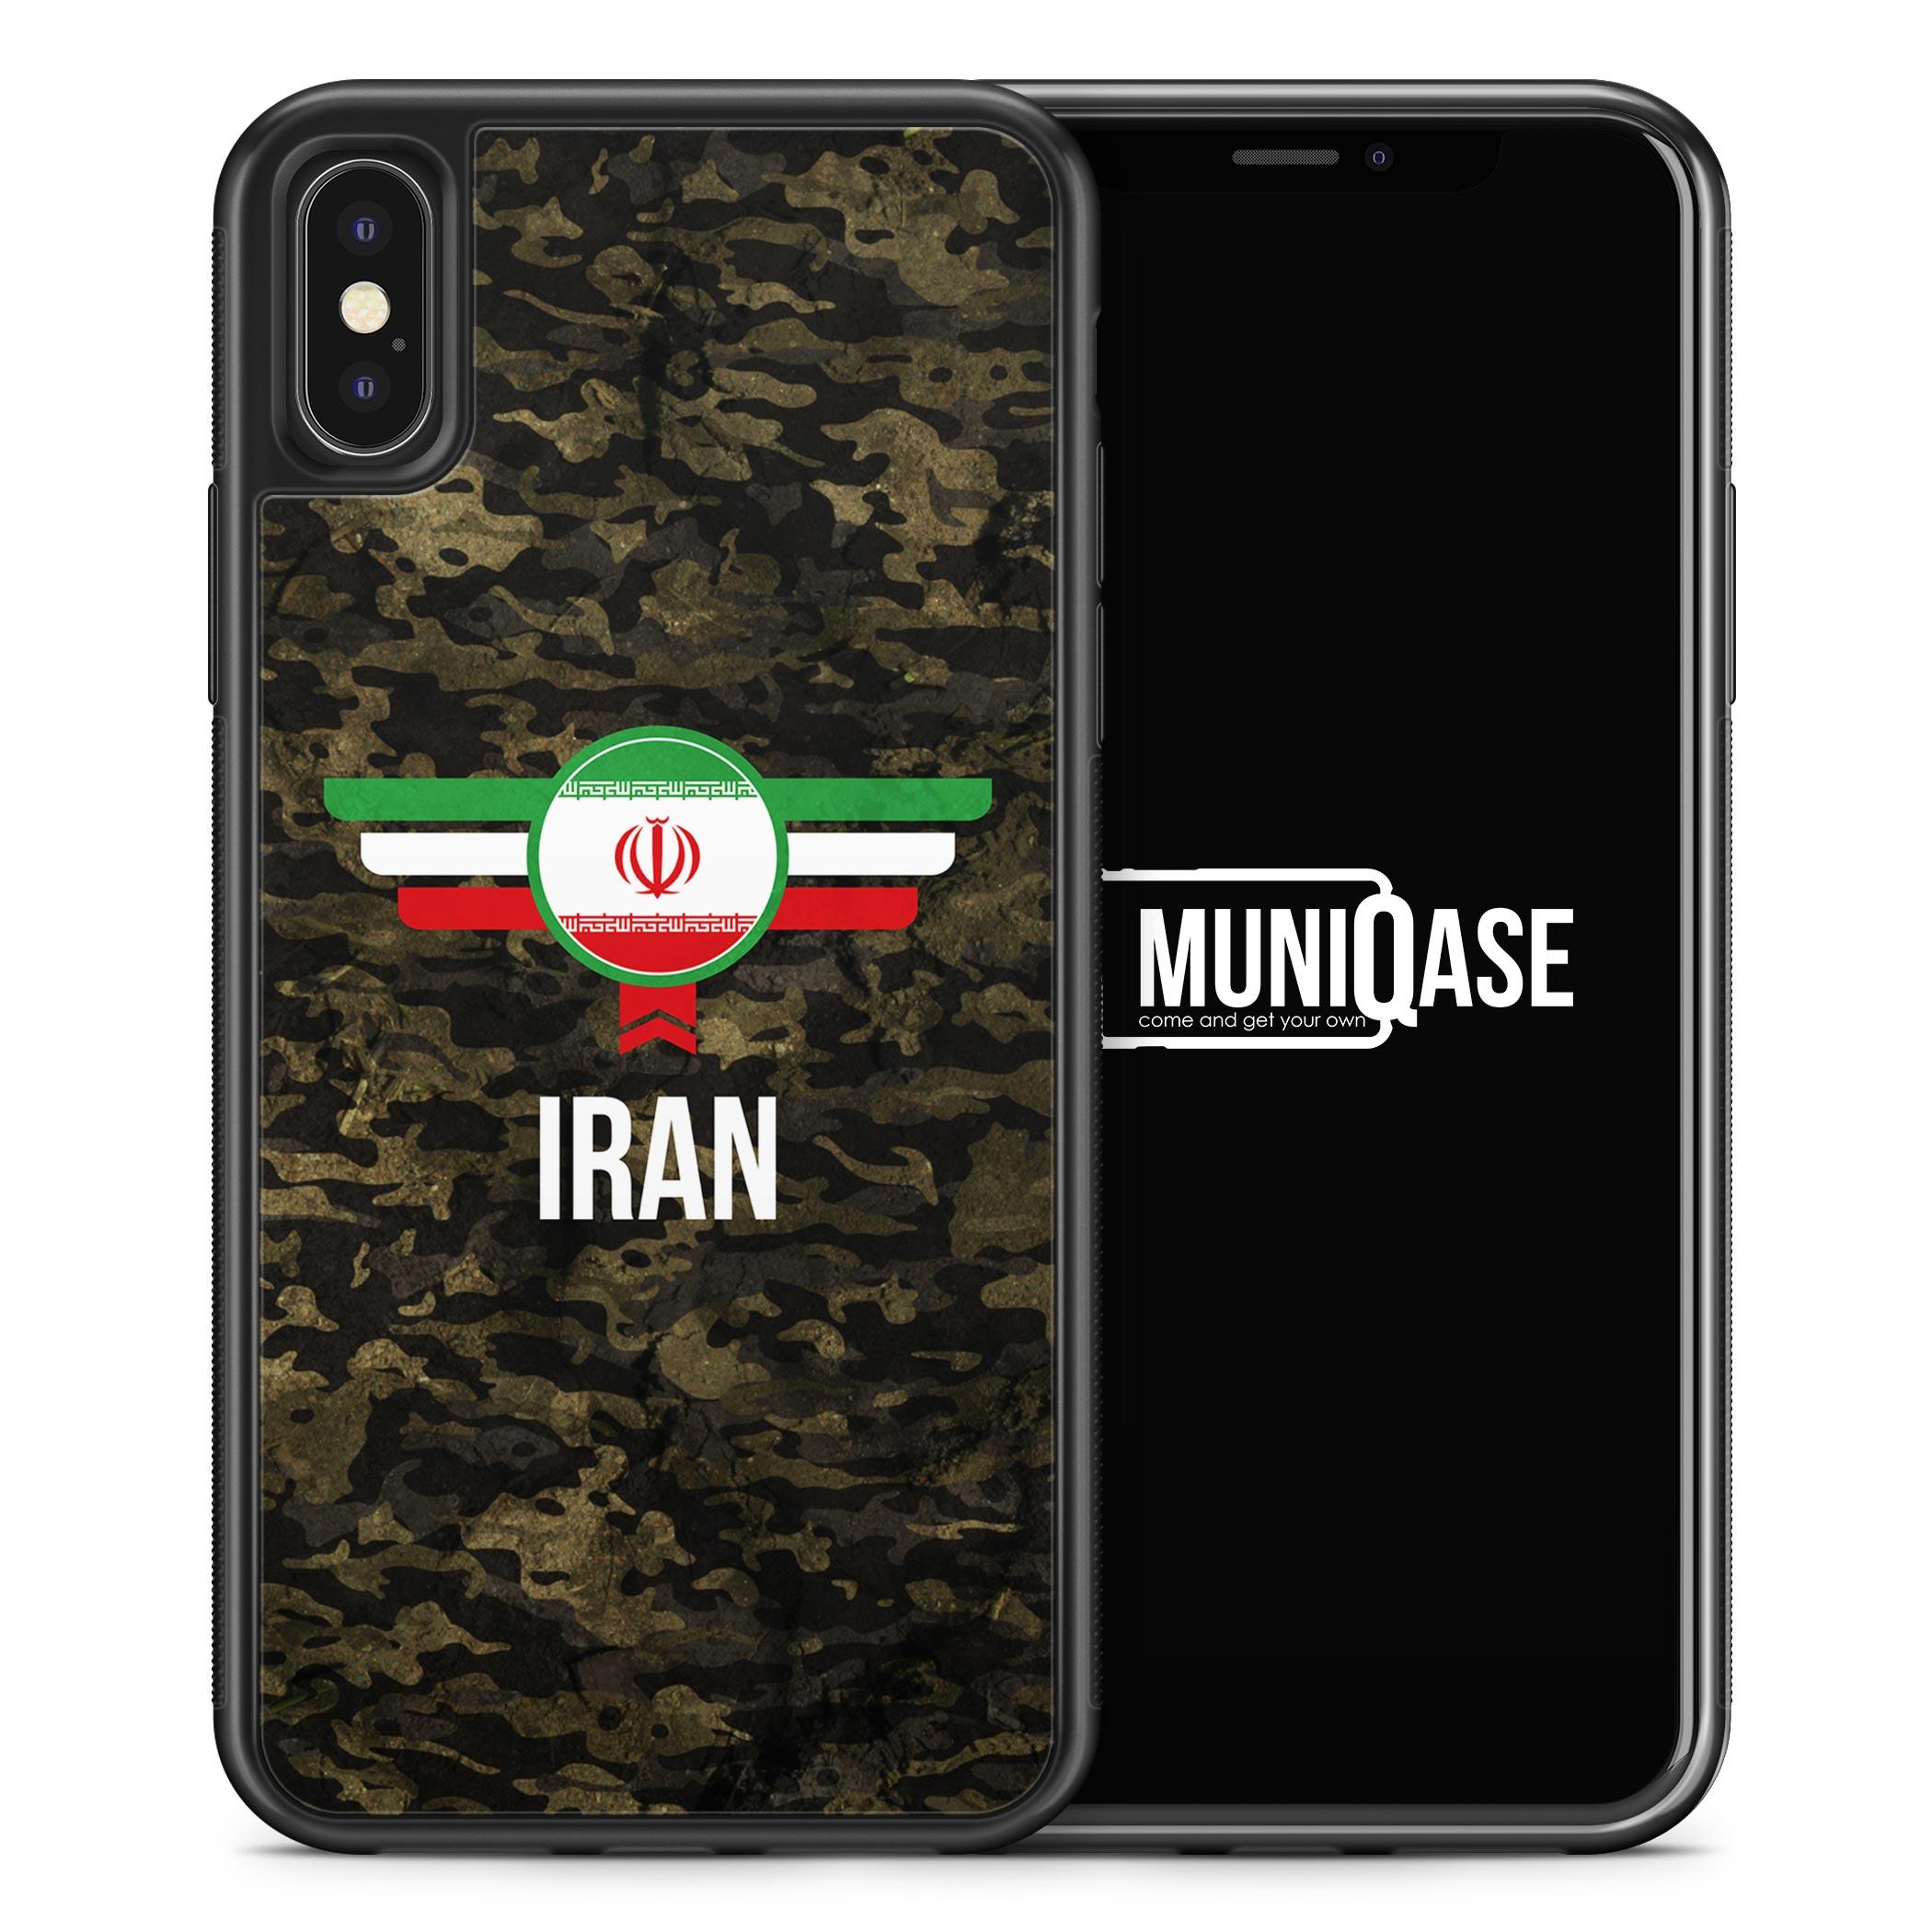 iPhone X Hülle SILIKON - Iran Camouflage mit Schriftzug